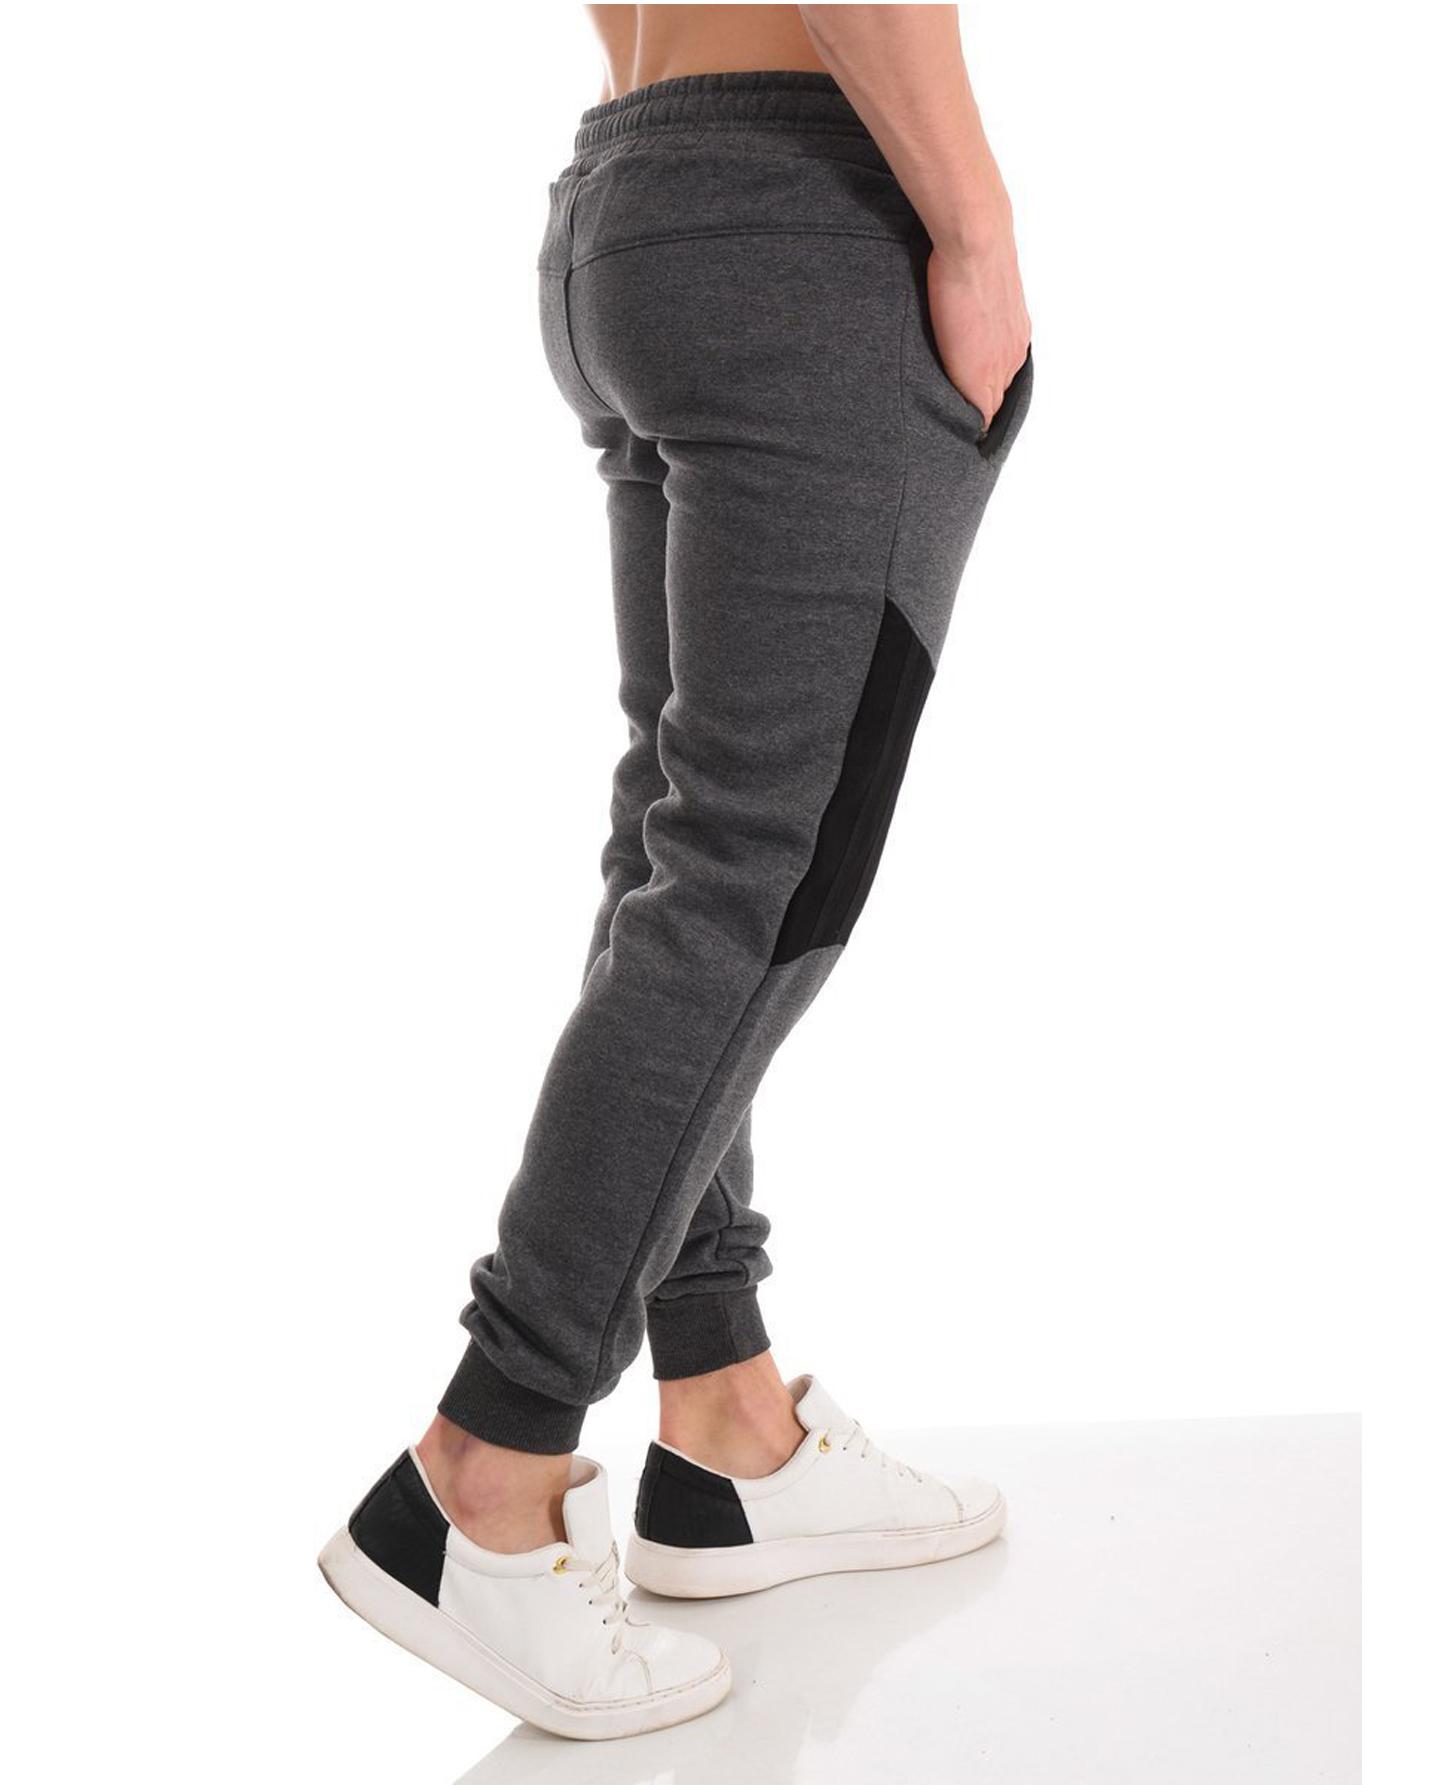 Men's Casual Zipper Stitching Trousers Autumn Pants Sports Jogging Pants 2020 New Men's Pants Tight Long Cotton Pants Sports Pants 3